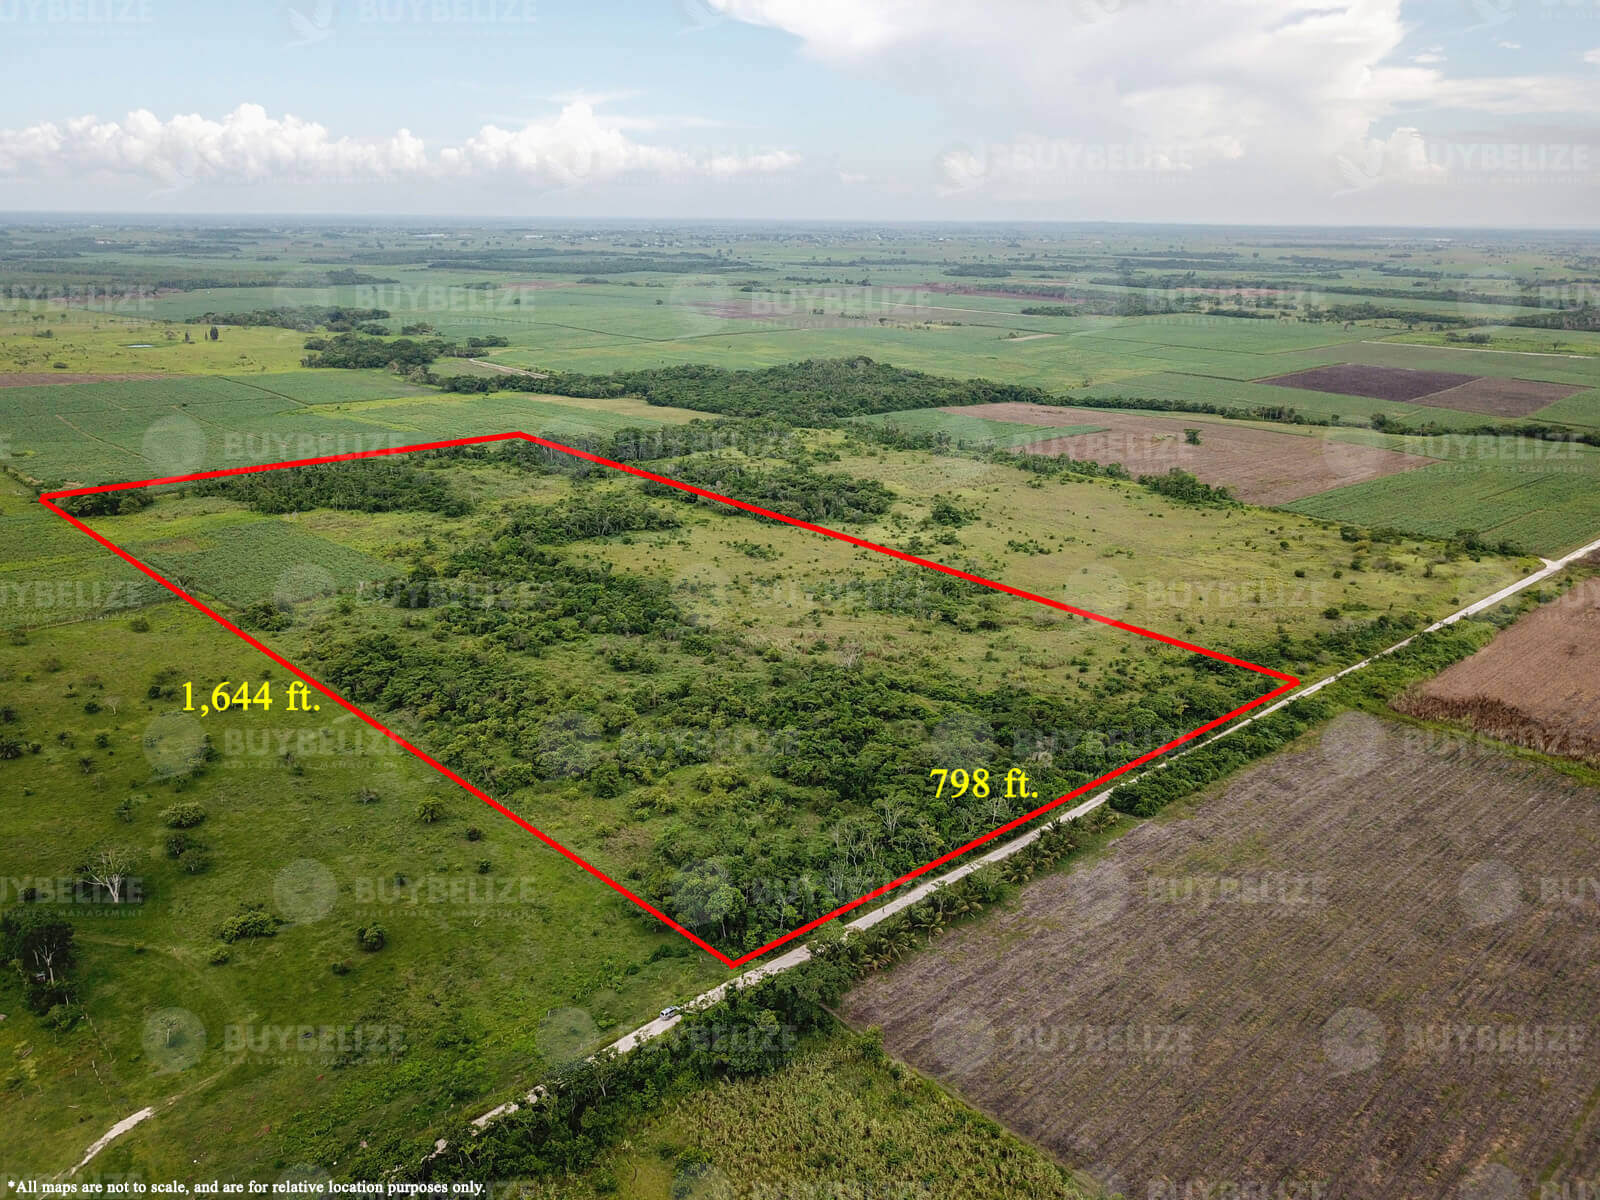 30 Acres of Prime Agricultural Land for Sale in Orange Walk District